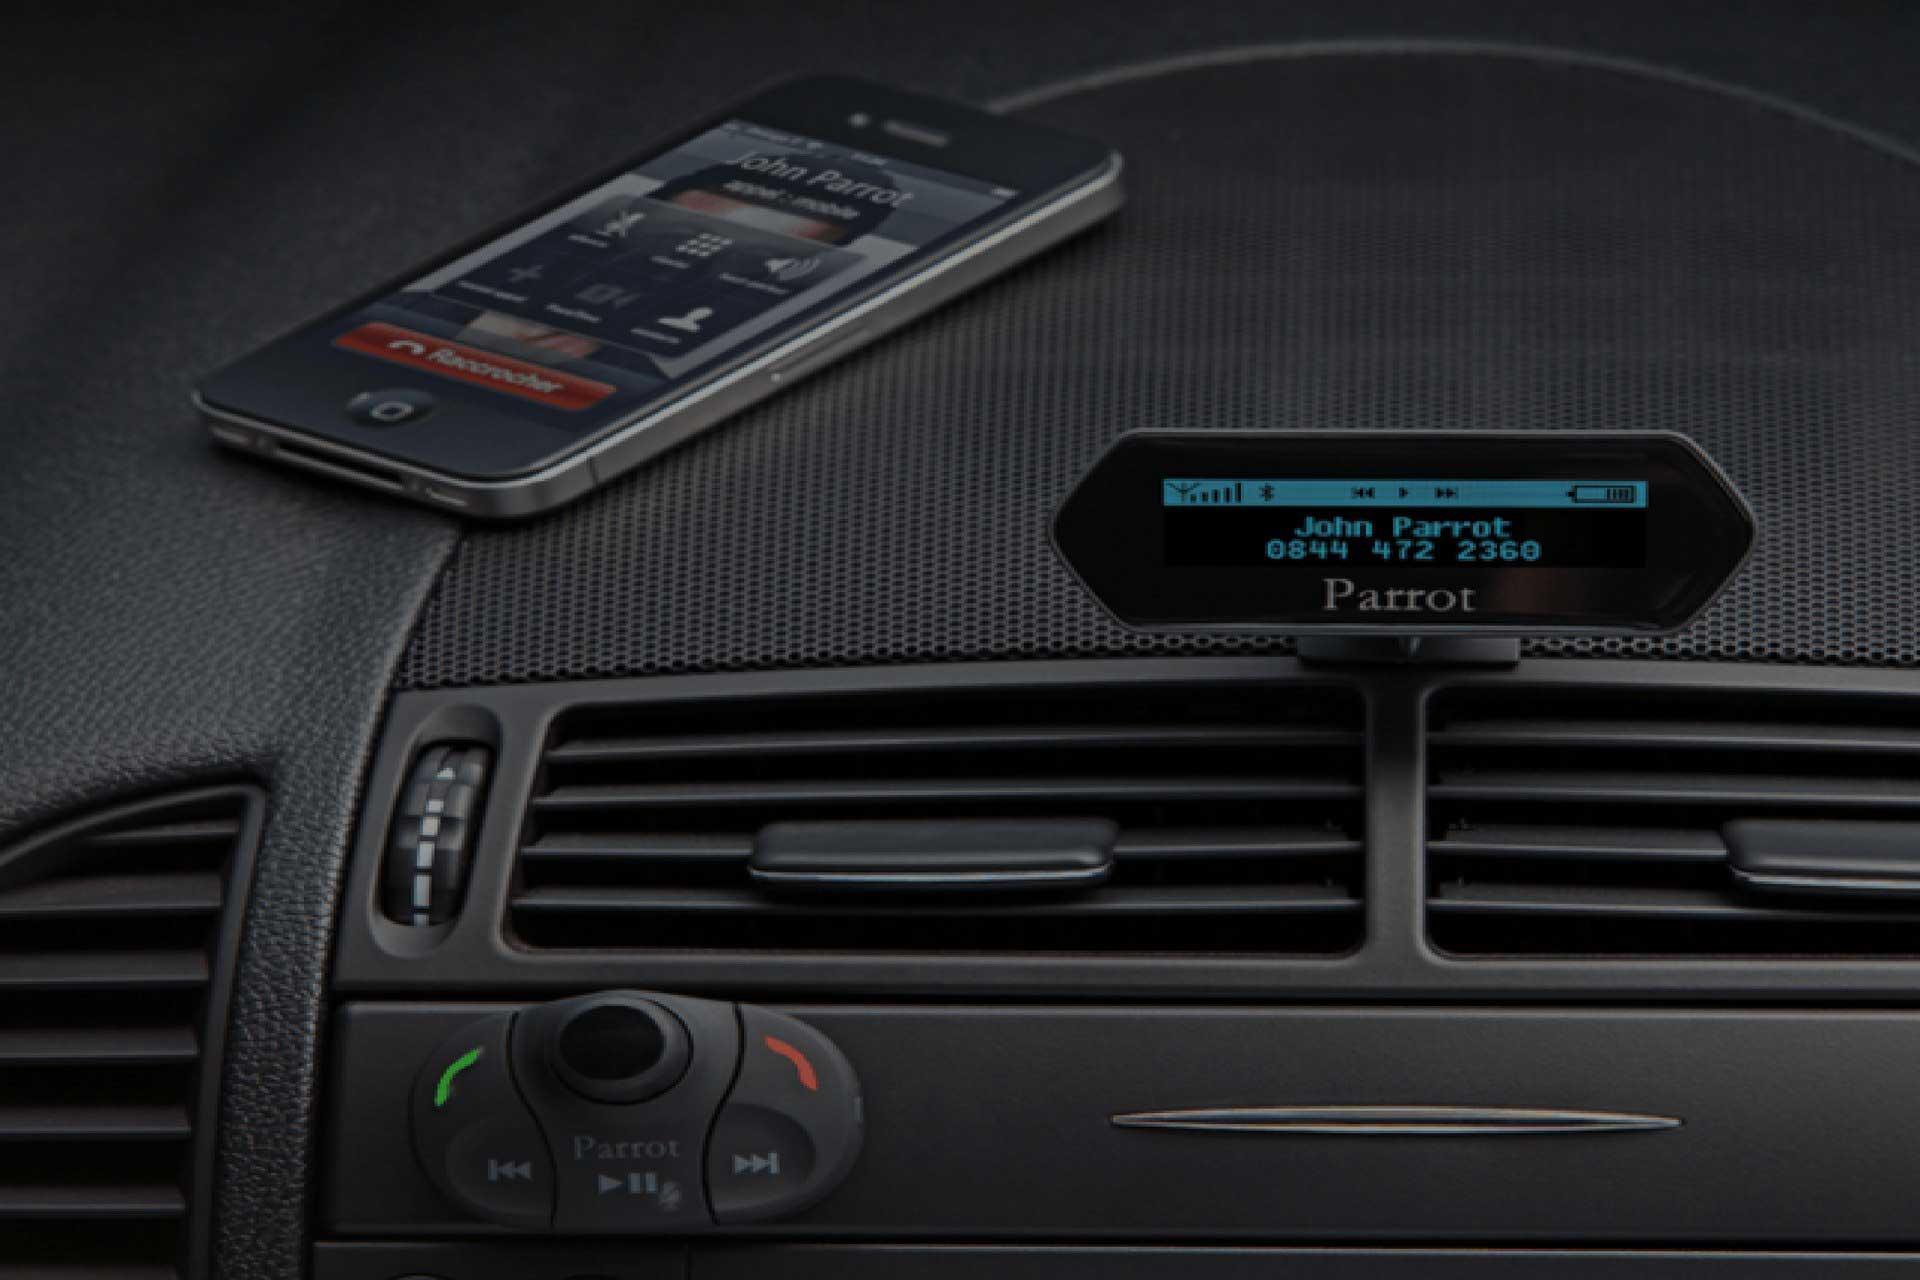 Bluetooth Hands Free Kits Hands Free Car Kits Mobile